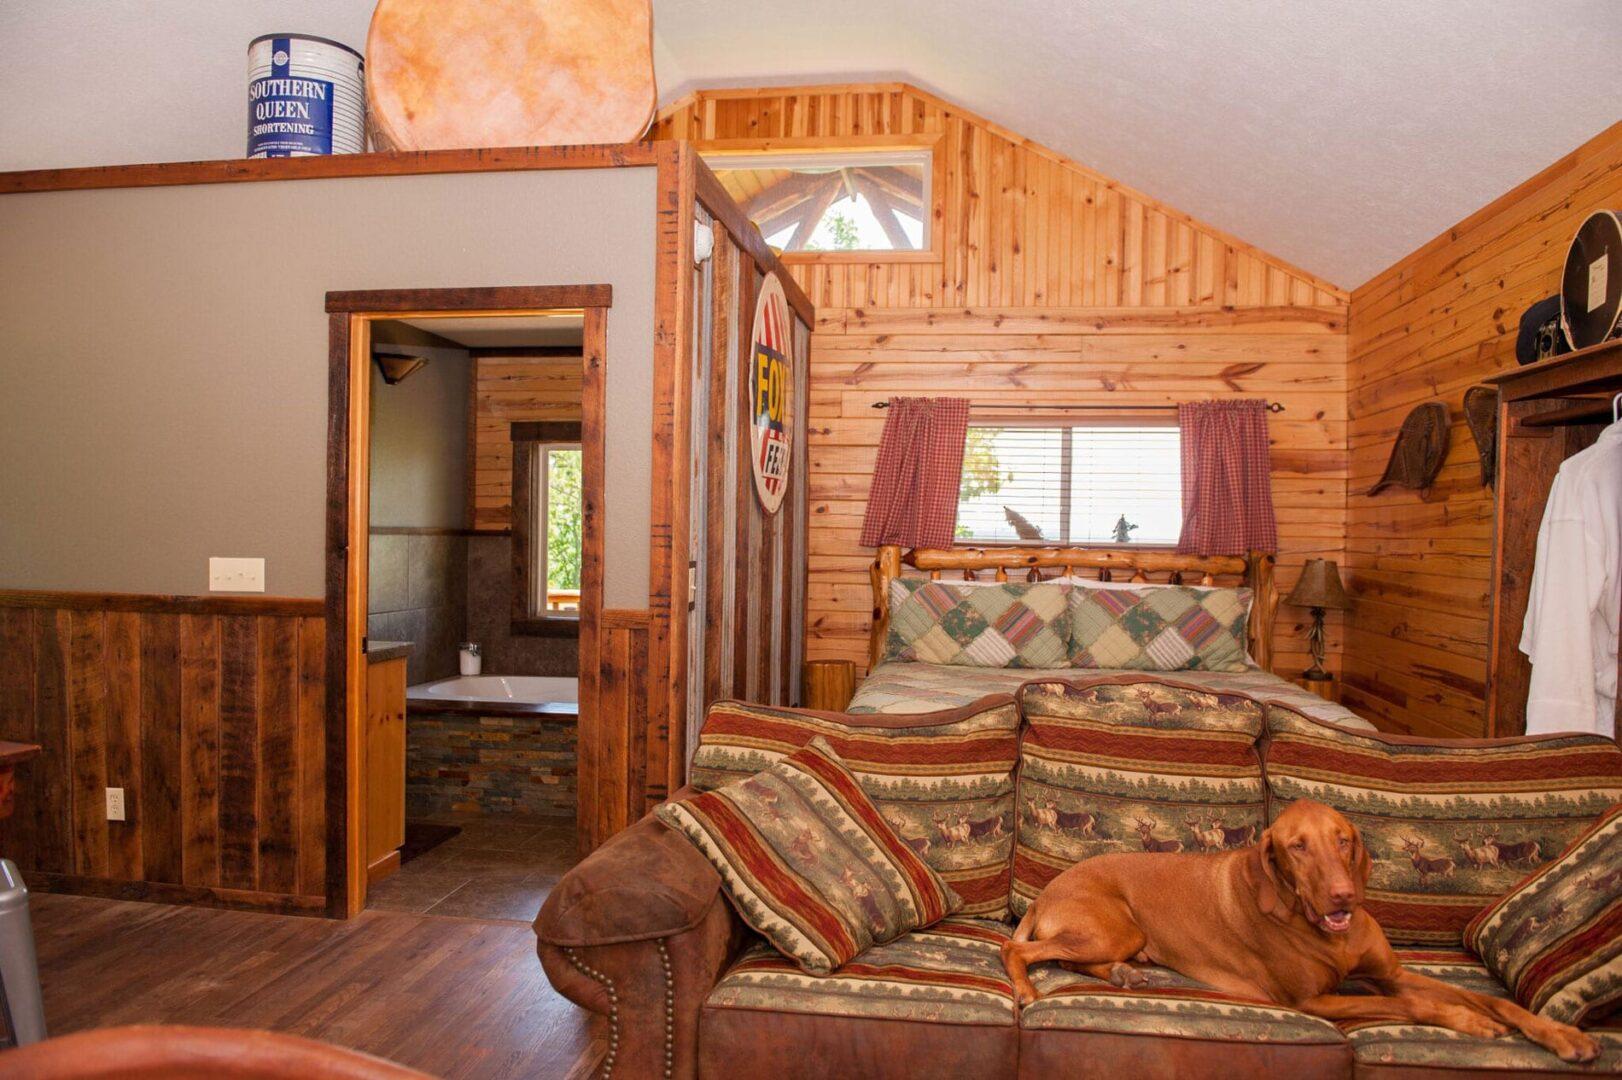 Beaver Lake View Resort